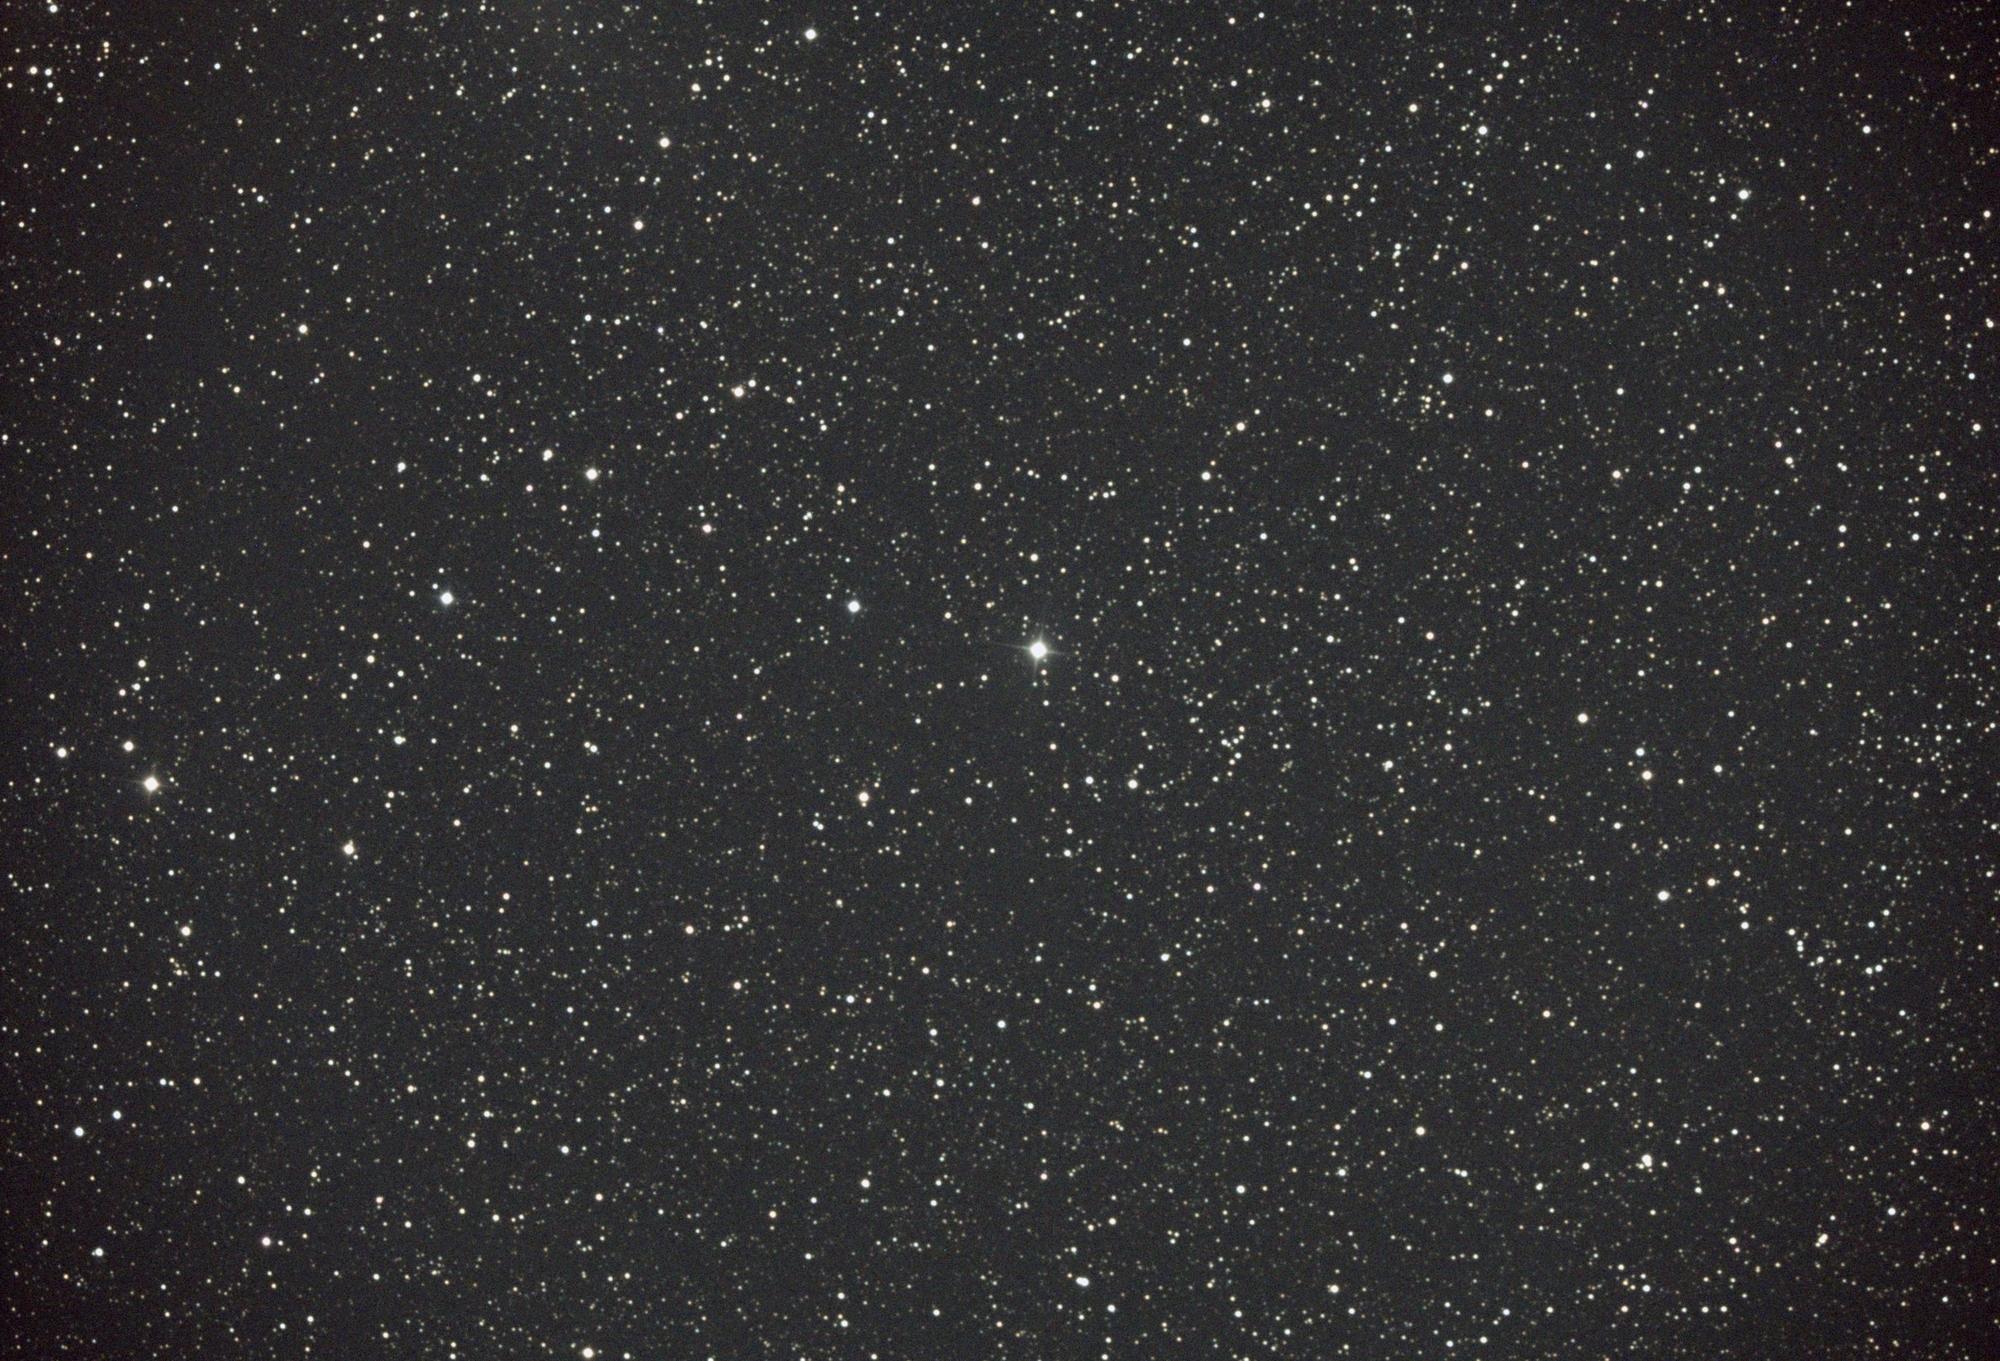 f:id:snct-astro:20200204000743j:plain